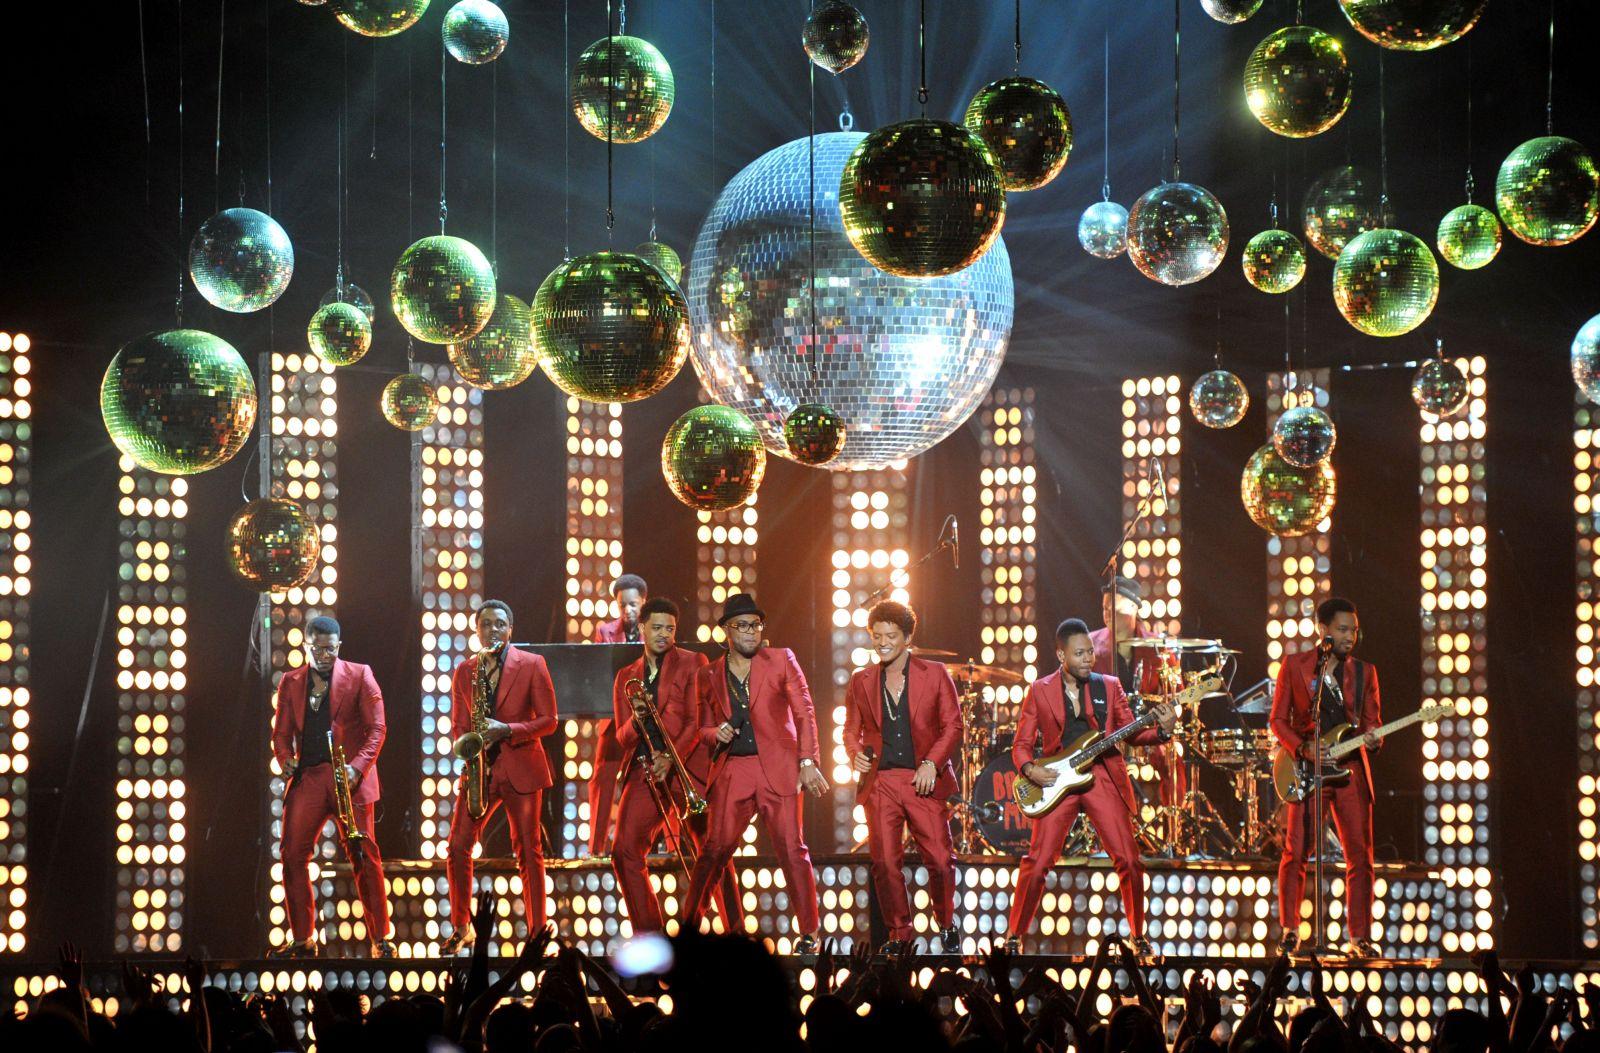 Звездам вручили награды на Billboard Music Awards-2013 - фото №2